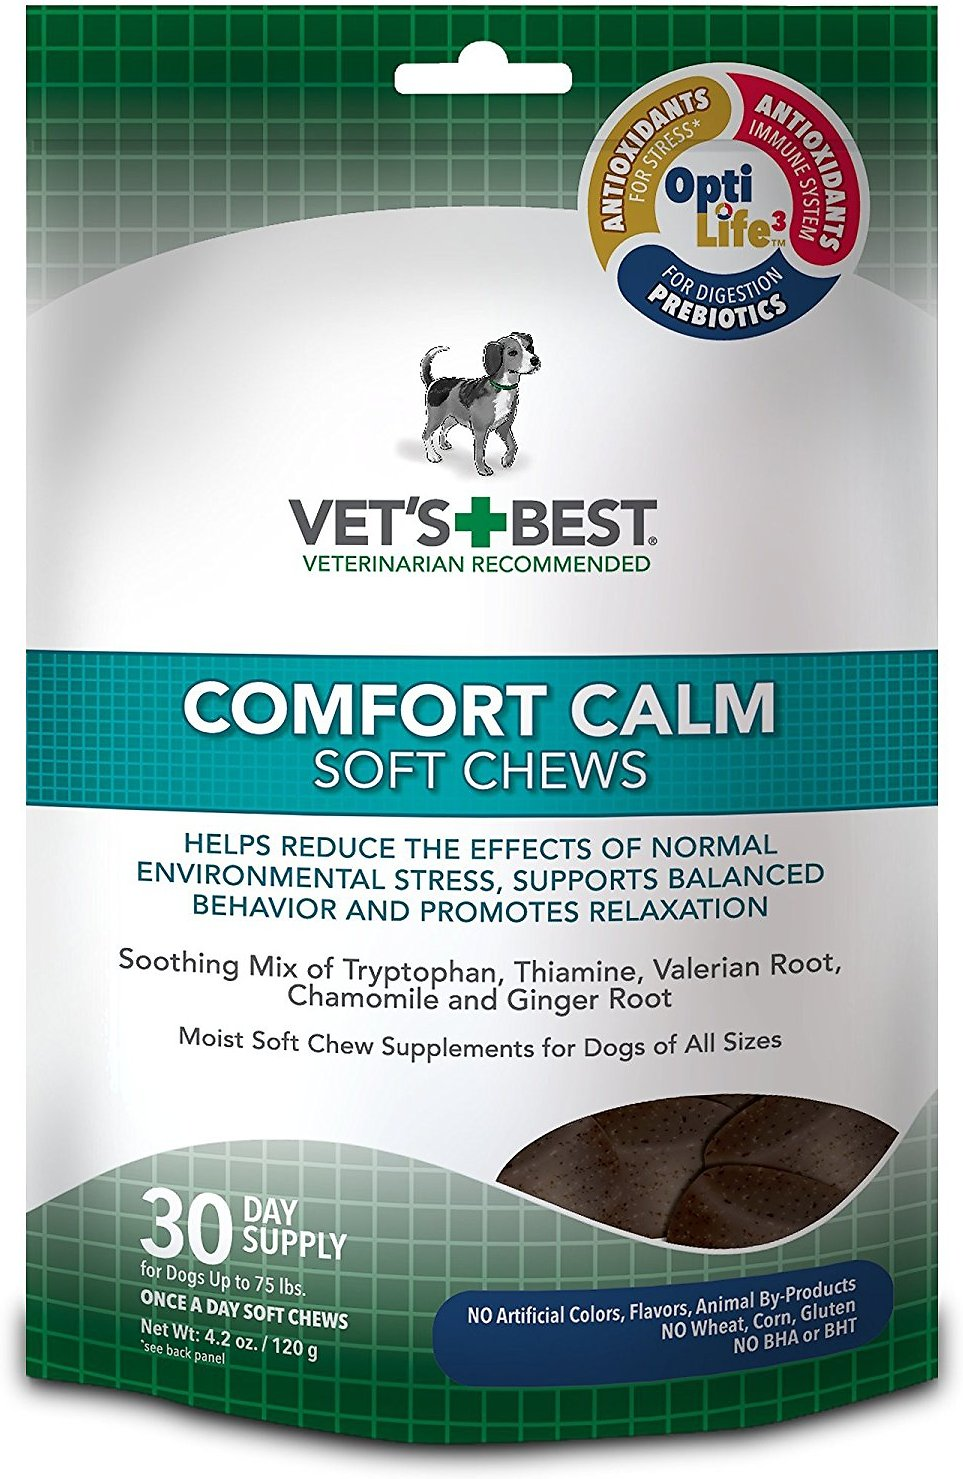 Vet's Best Comfort Calm Soft Chews Dog Supplement, 30 count